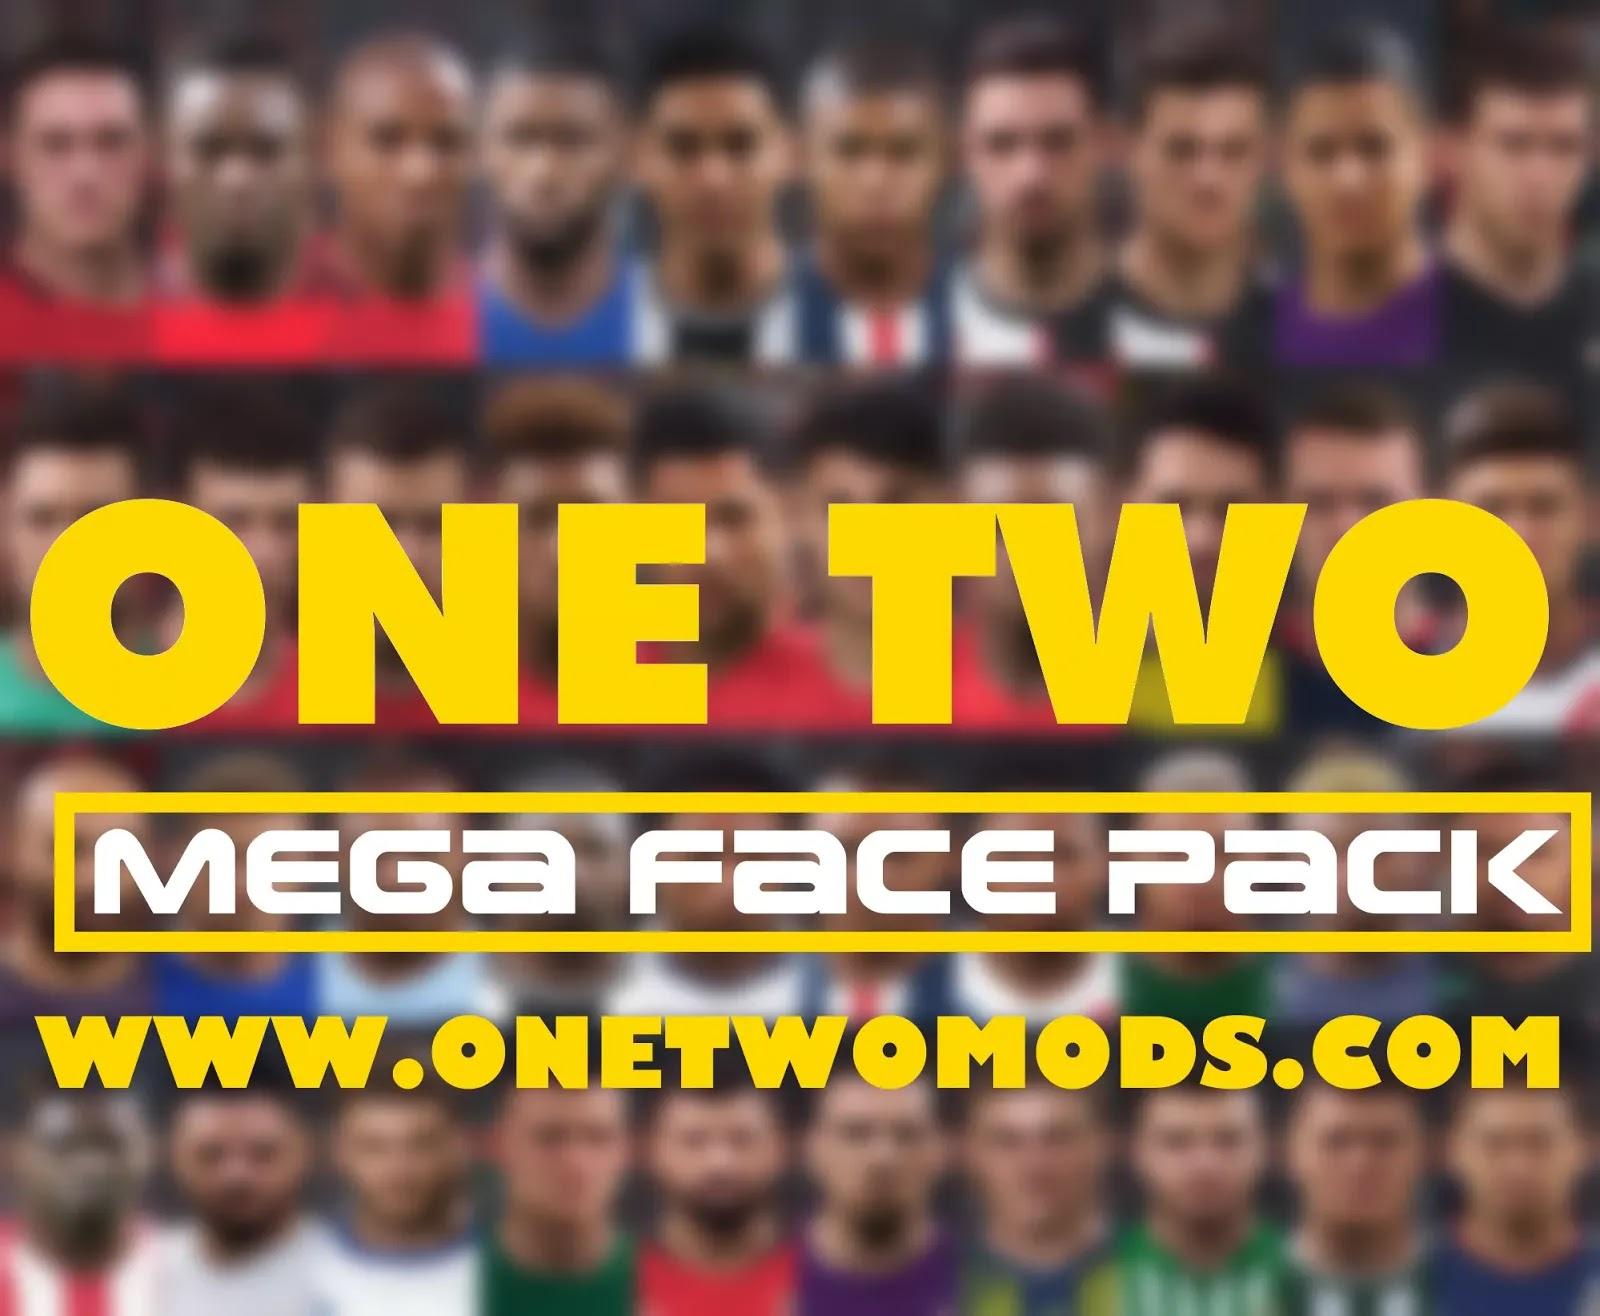 أفضل واحدث باك اوجه لبيس 17 لاكثر من 7800 لاعب   PES 2017 Mega Facepack 2021 (7800 Faces)